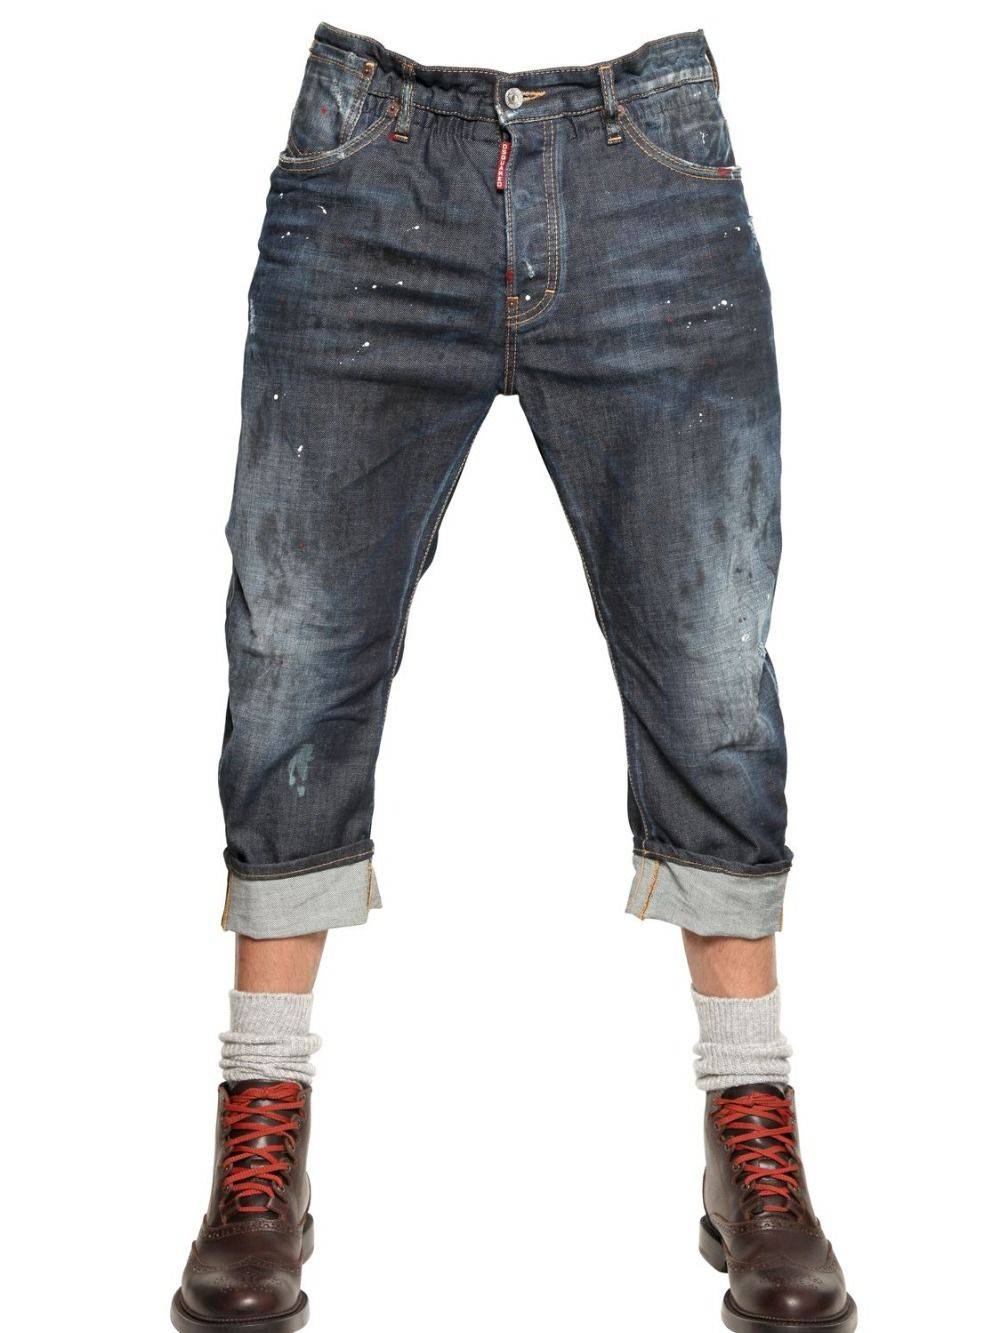 latest design jeans pants new pattern jeans pants new style jeans pent men(LOTM104), View new style jeans pent men, lotfeel Product Details from Guangzhou Lotdu Commerce Co., Ltd. on Alibaba.com